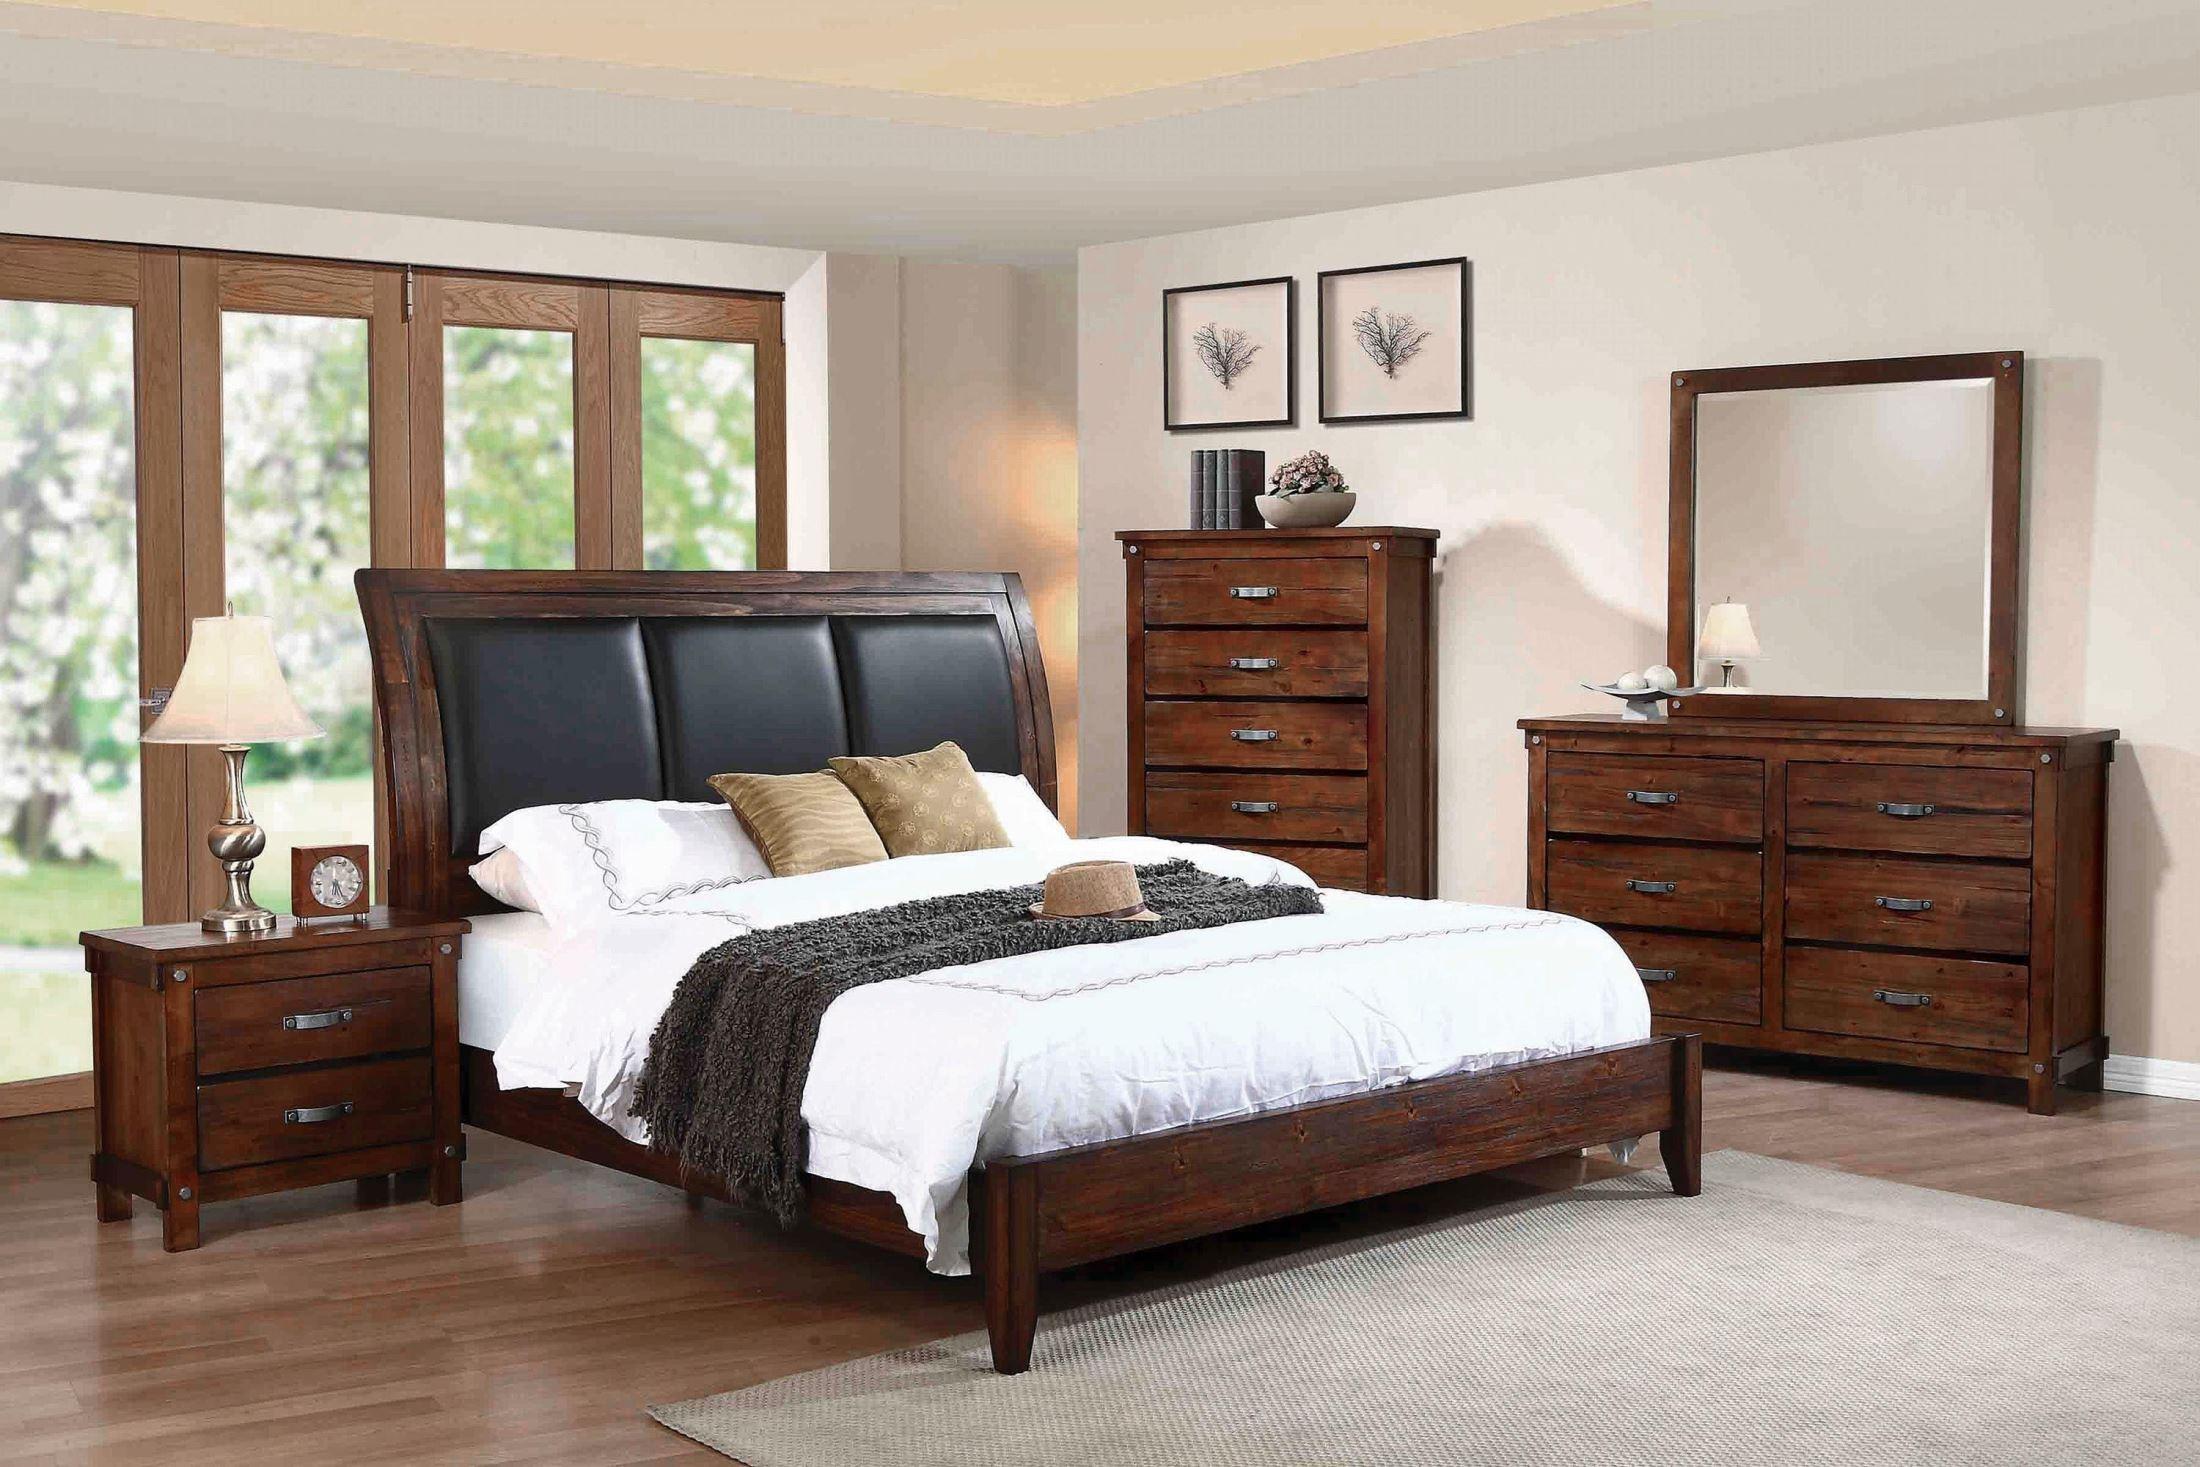 Noble Rustic Oak Platform Bedroom Set From Coaster